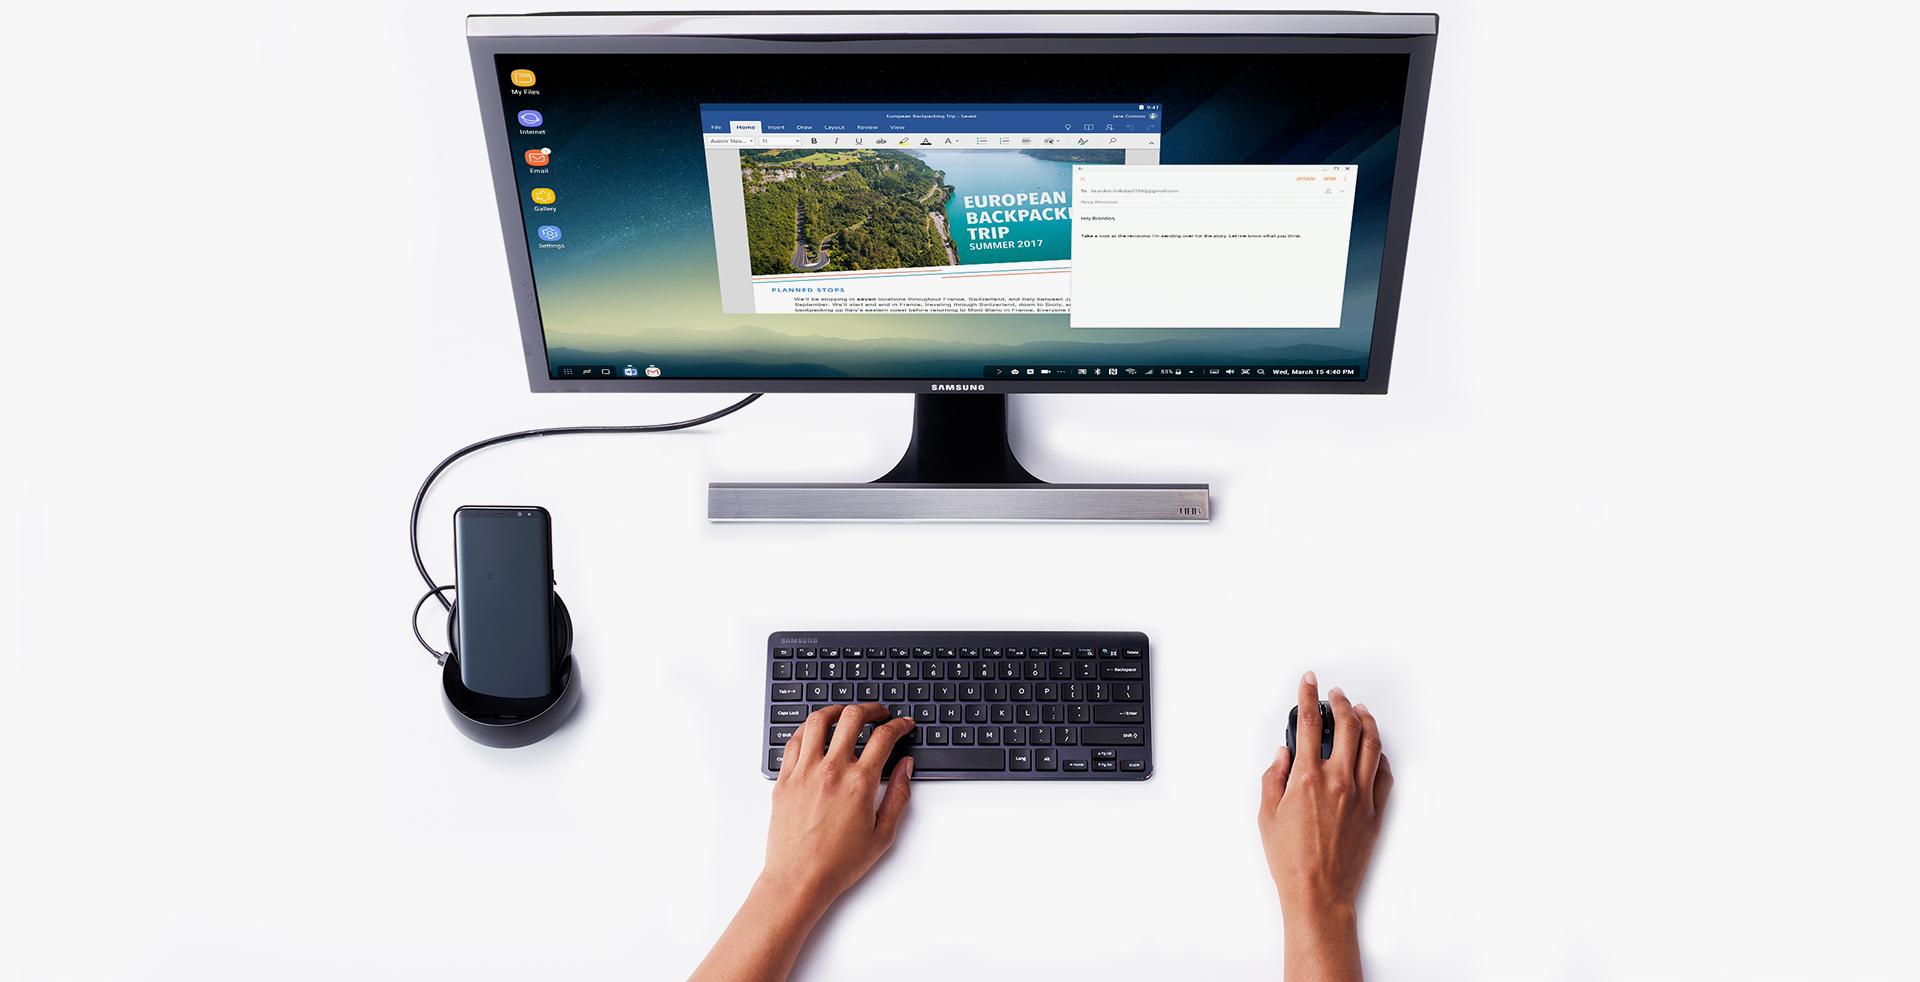 Samsung_DeX_Galaxy_S8_desktop_7.jpeg